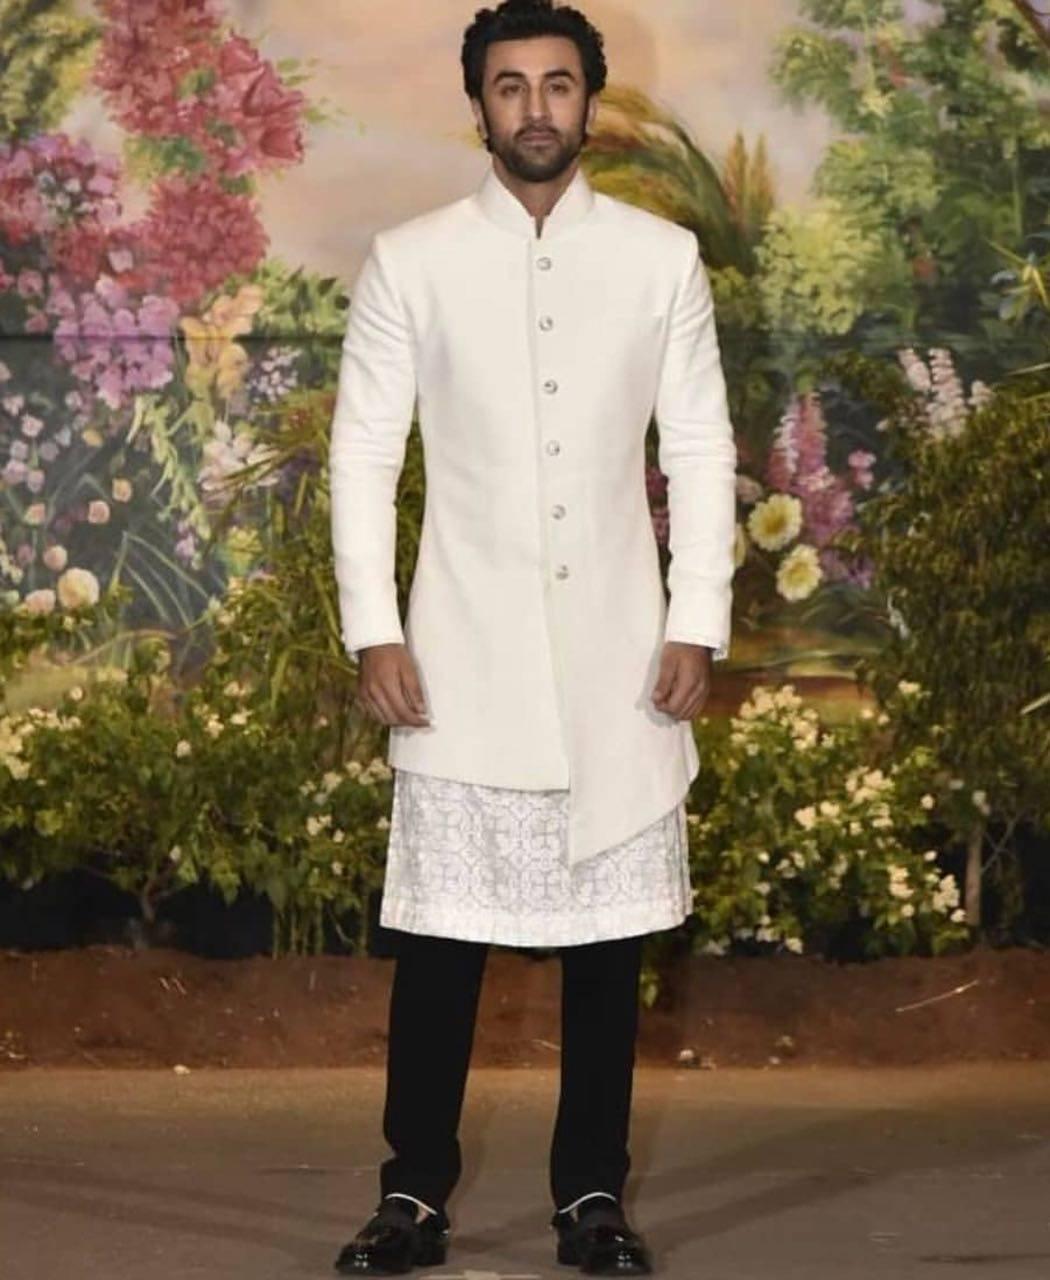 ranbir kapoor pic from Sonam Kapoor reception